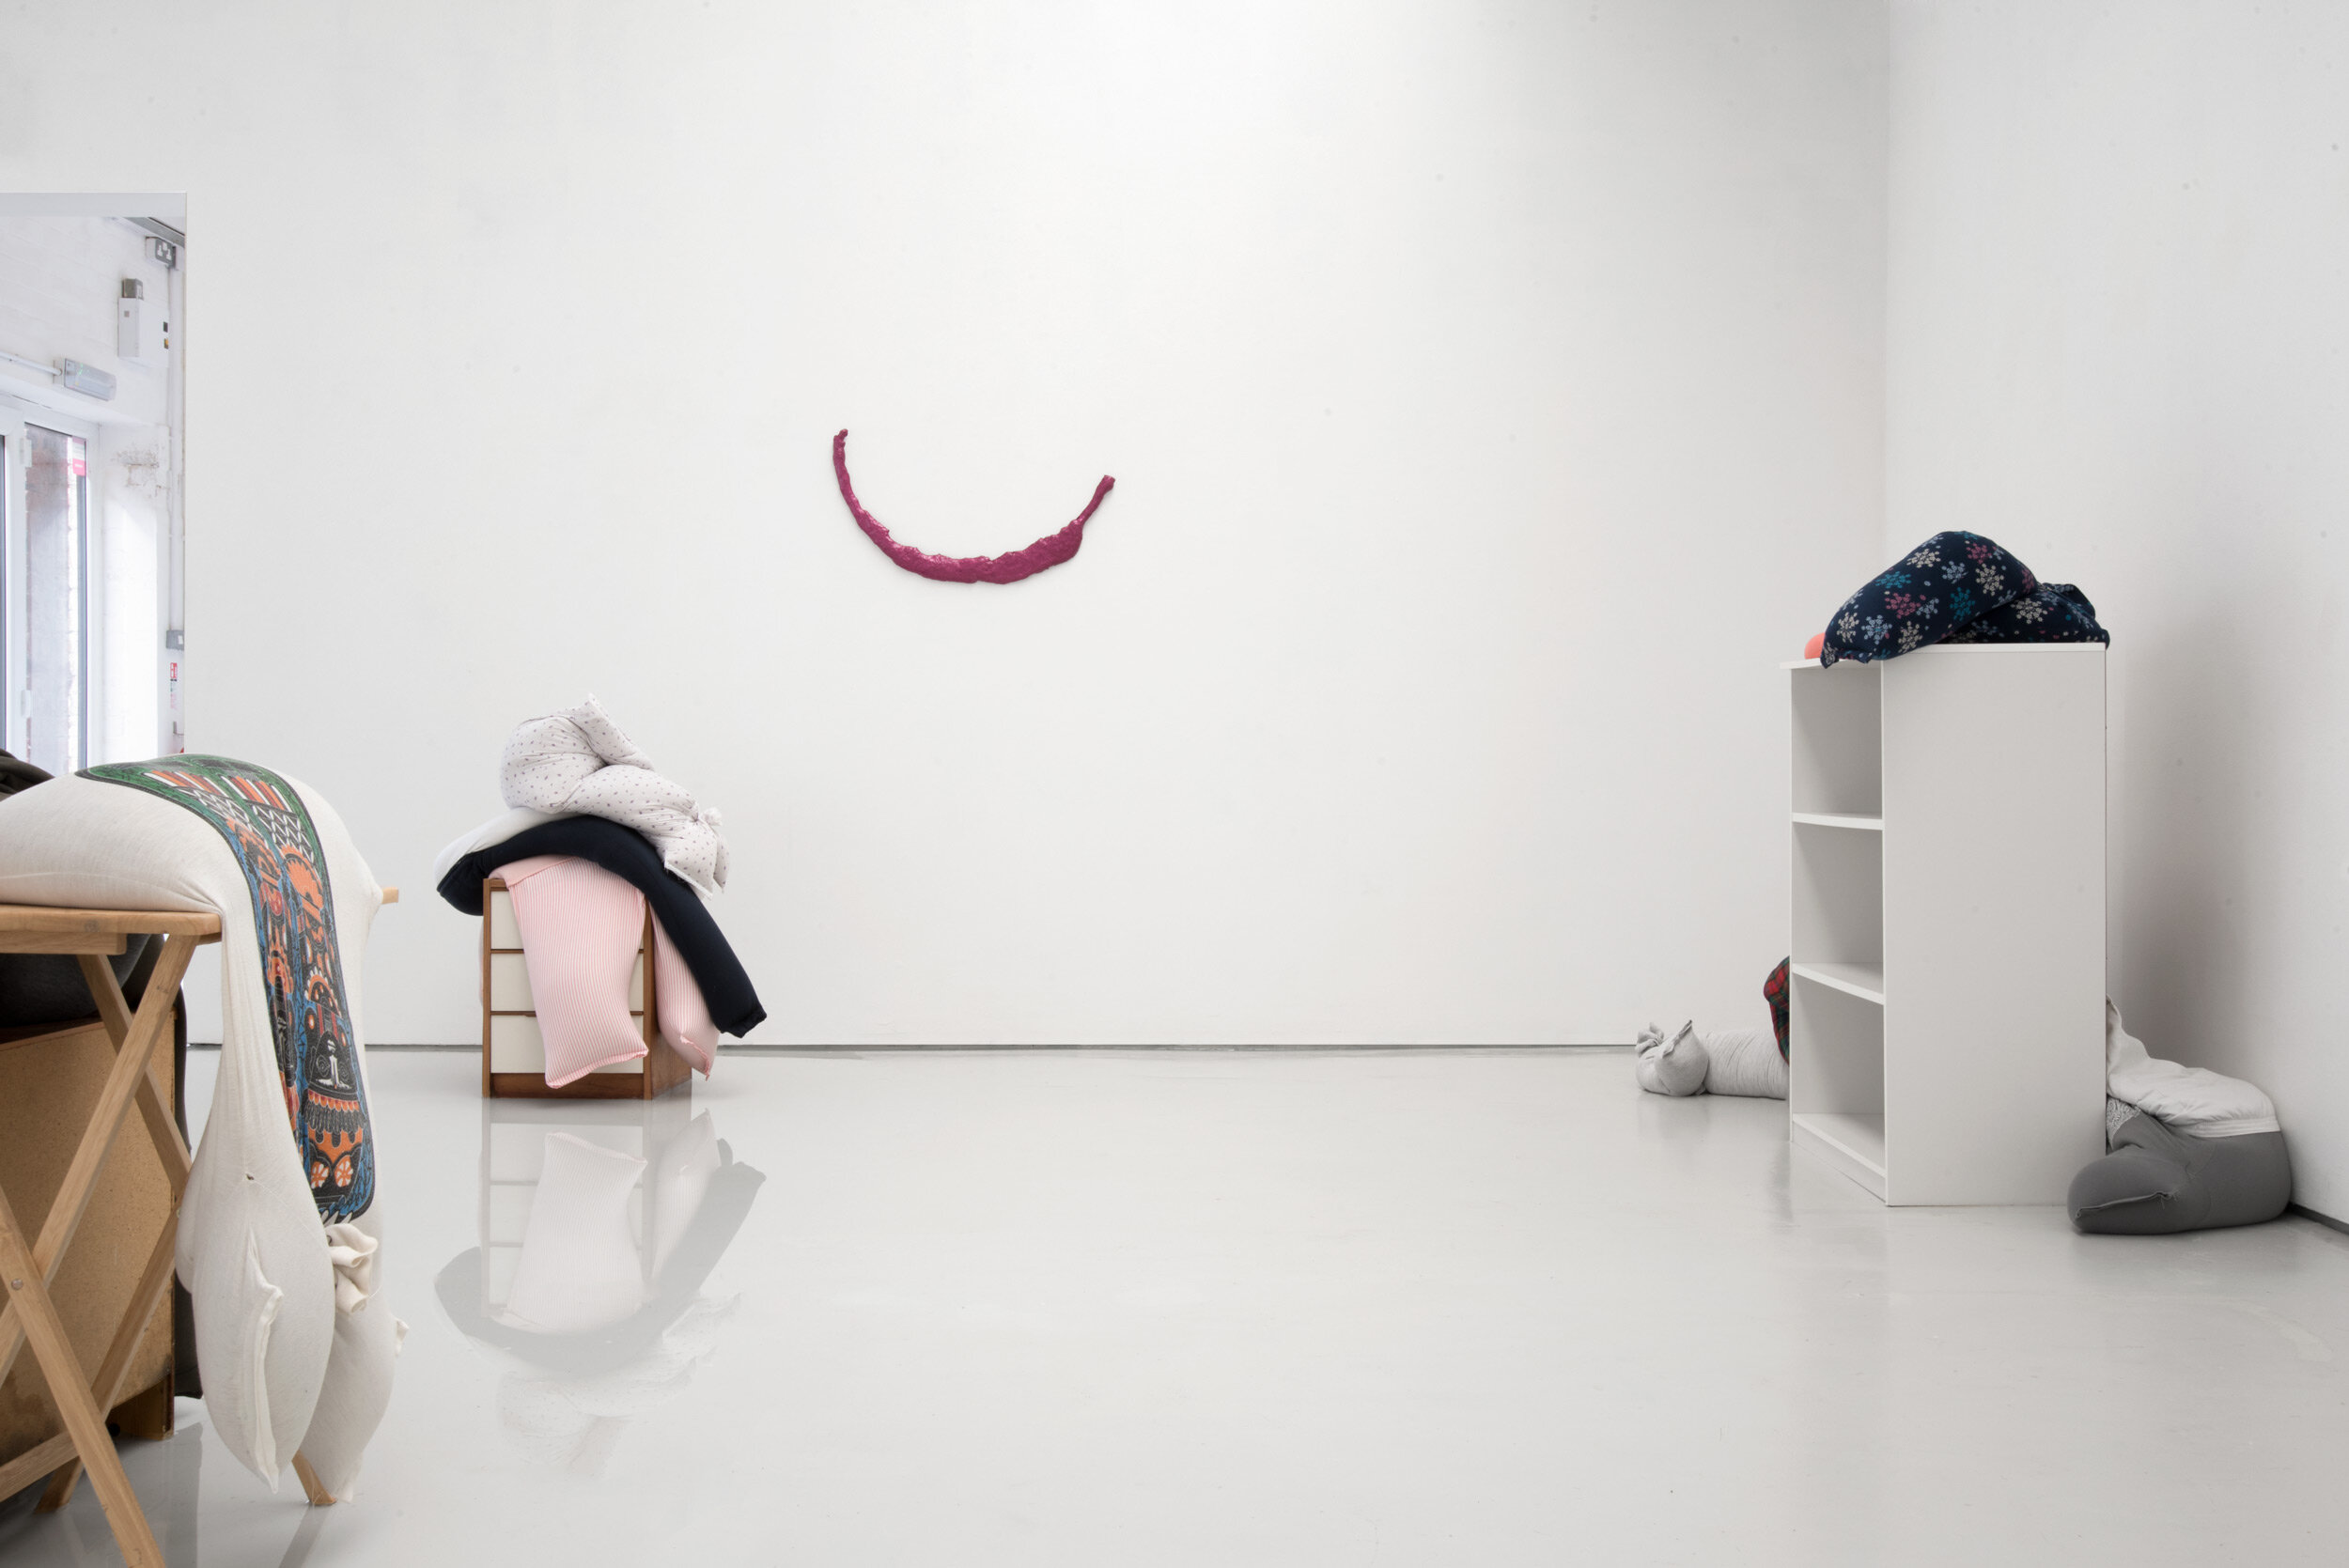 Fall, slump, drop on a bedside cabinet in water[...], Installation View, Alex Farrar, Bloc Projects, 2019, 5.jpg